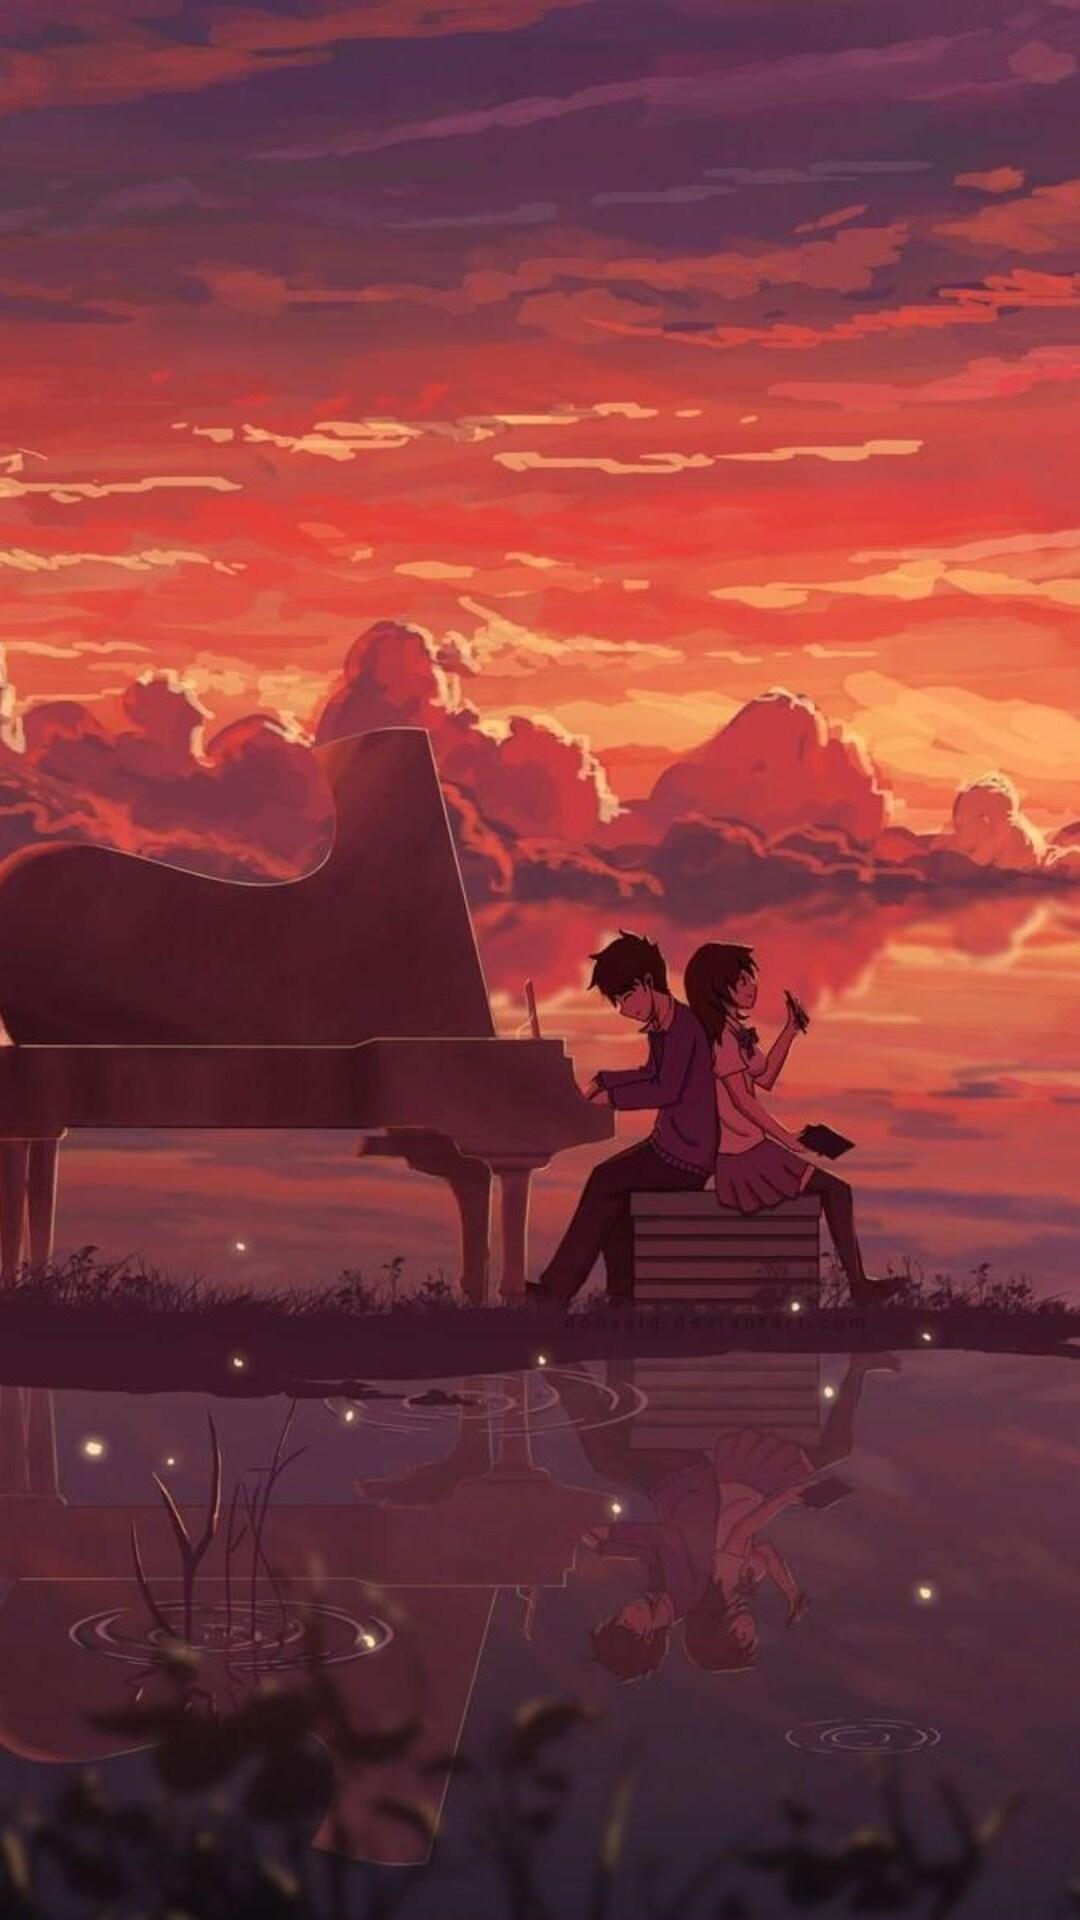 Sad Boy And Girl Love Wallpaper Hd 1080x1920 Anime Love Digital Art Iphone 7 6s 6 Plus Pixel